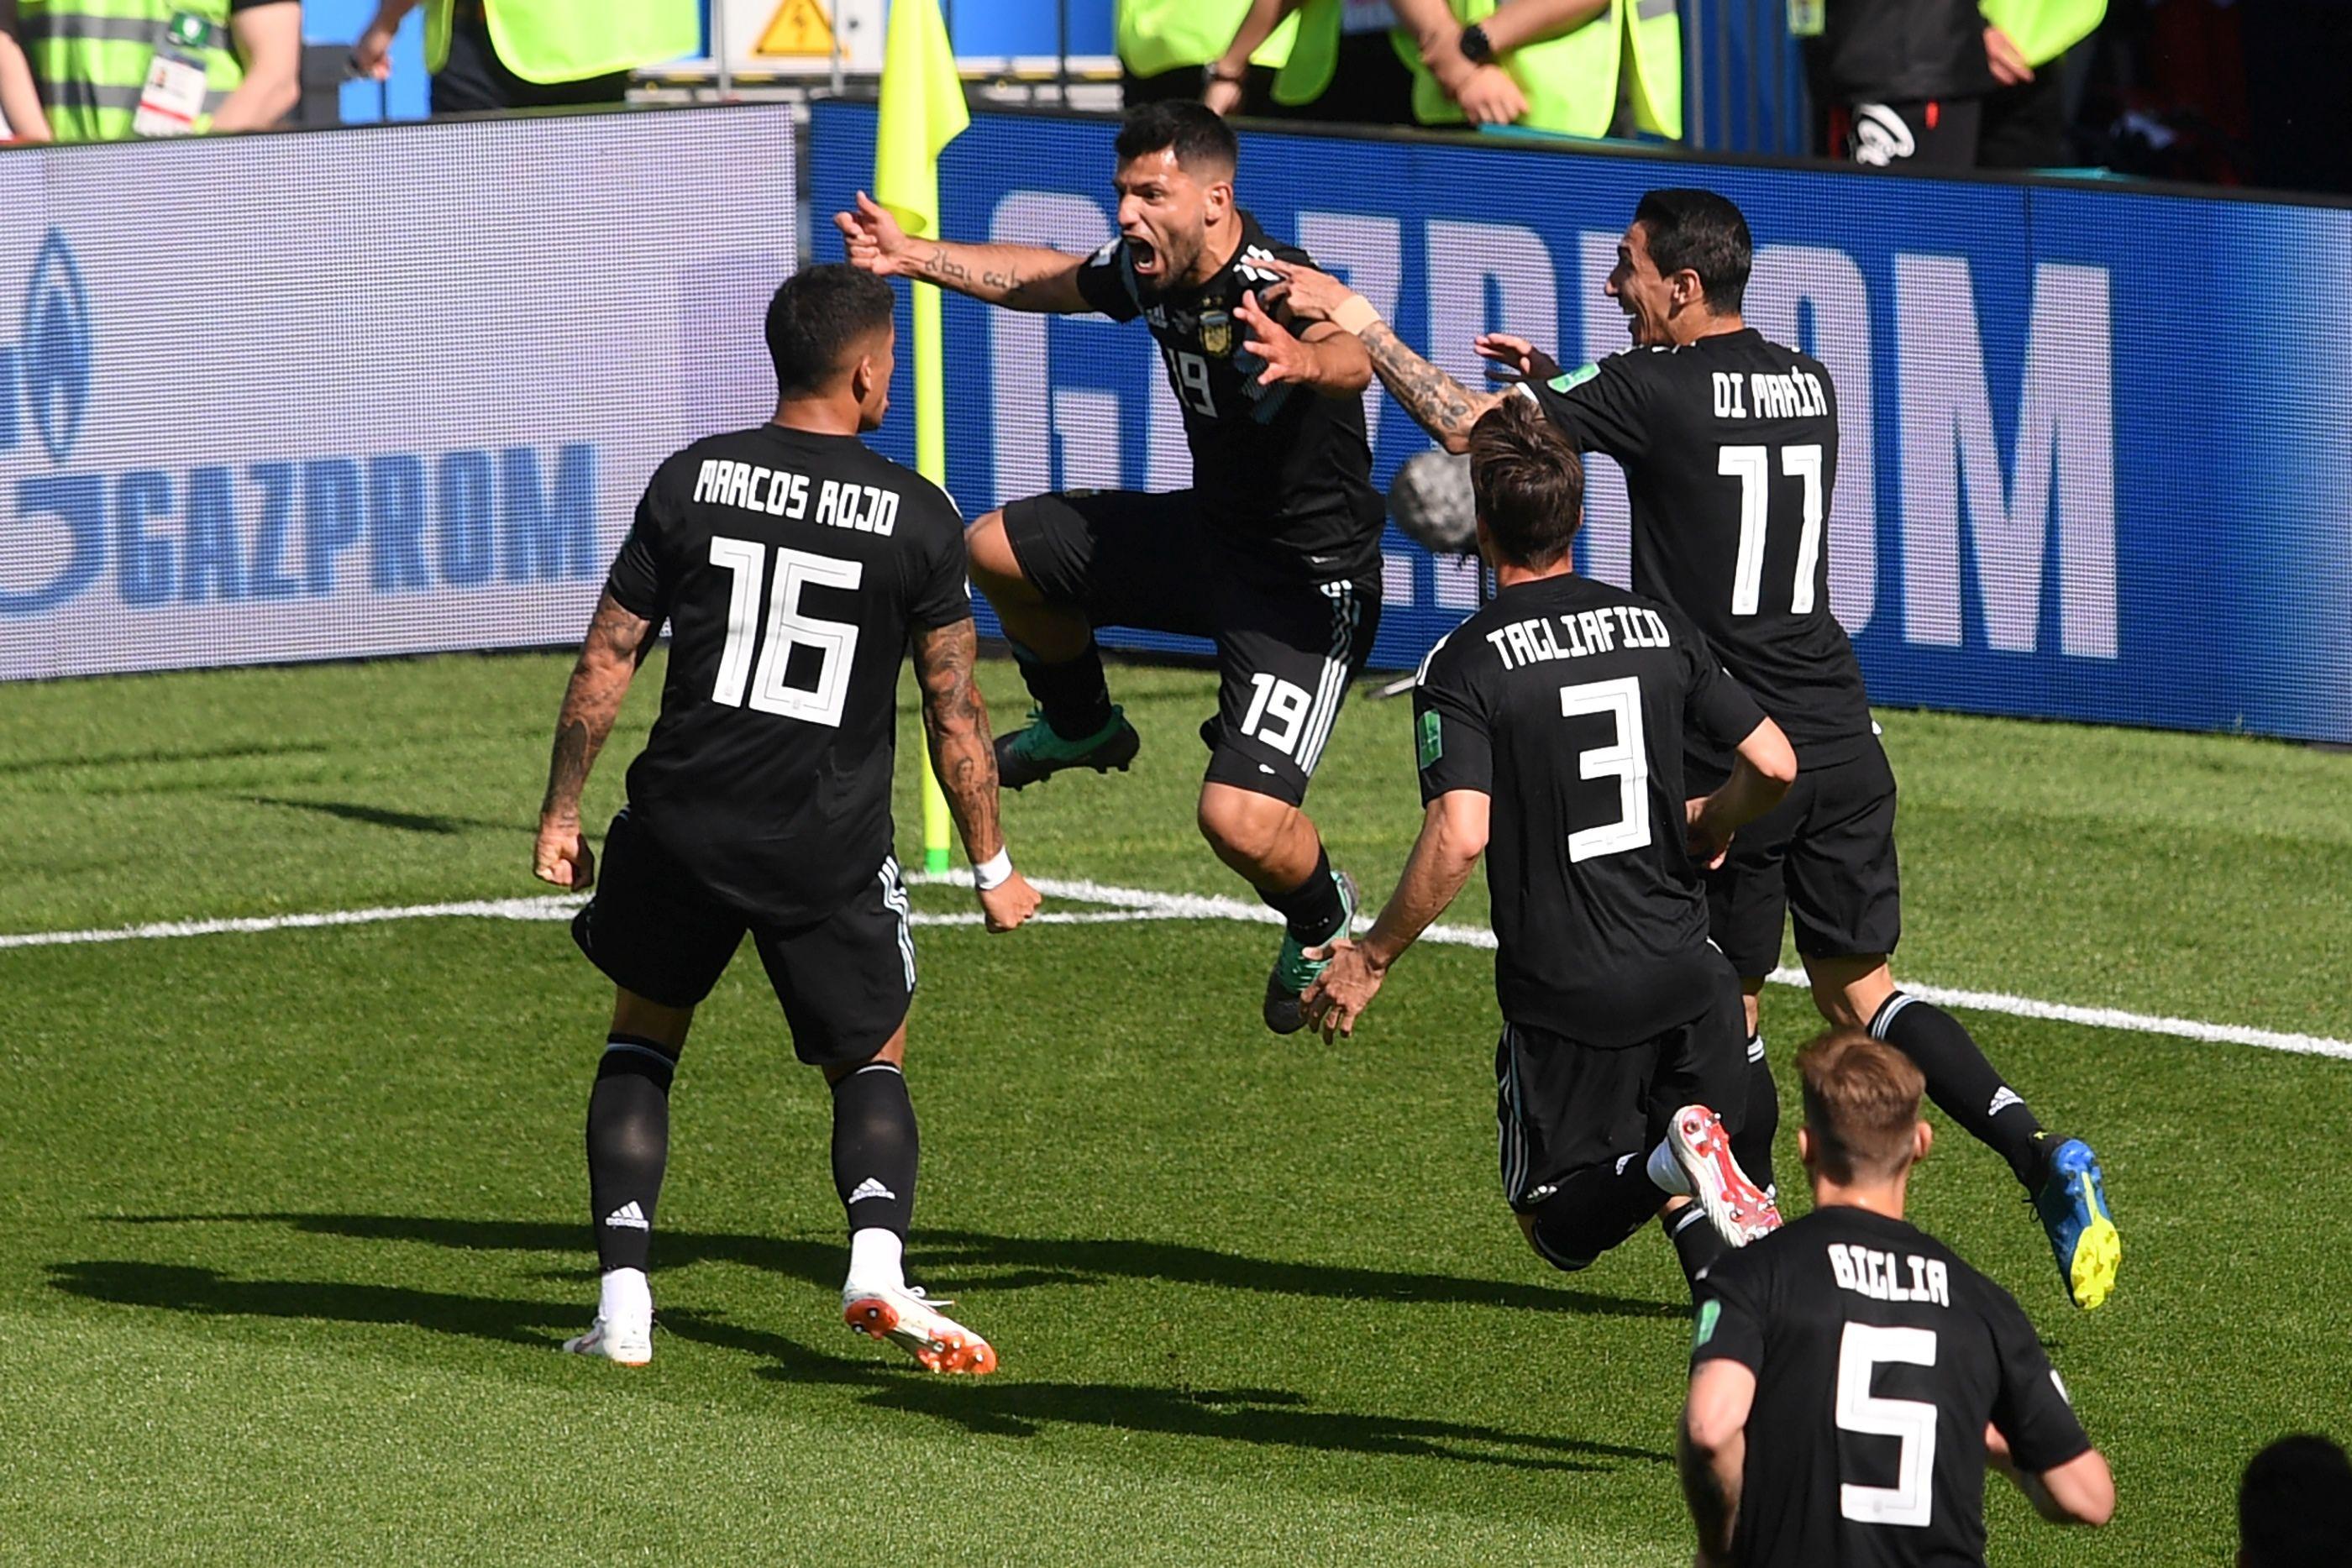 previo nigeria vs argentina grupo d mundial rusia 2018